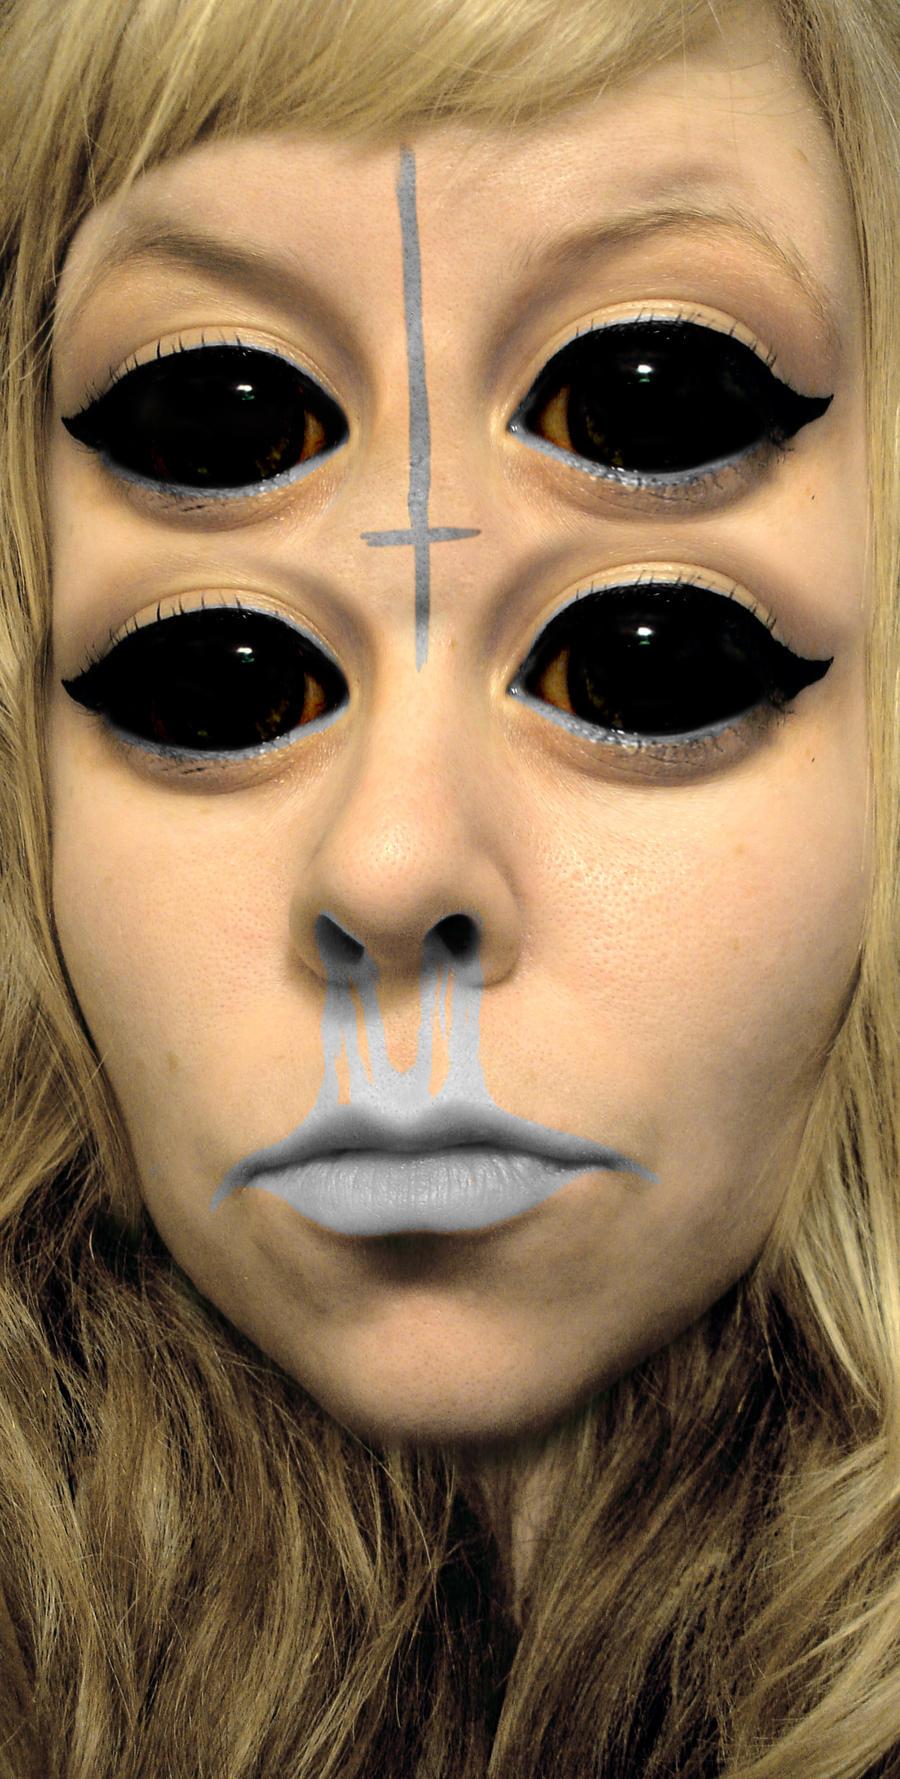 alien girl by octodream